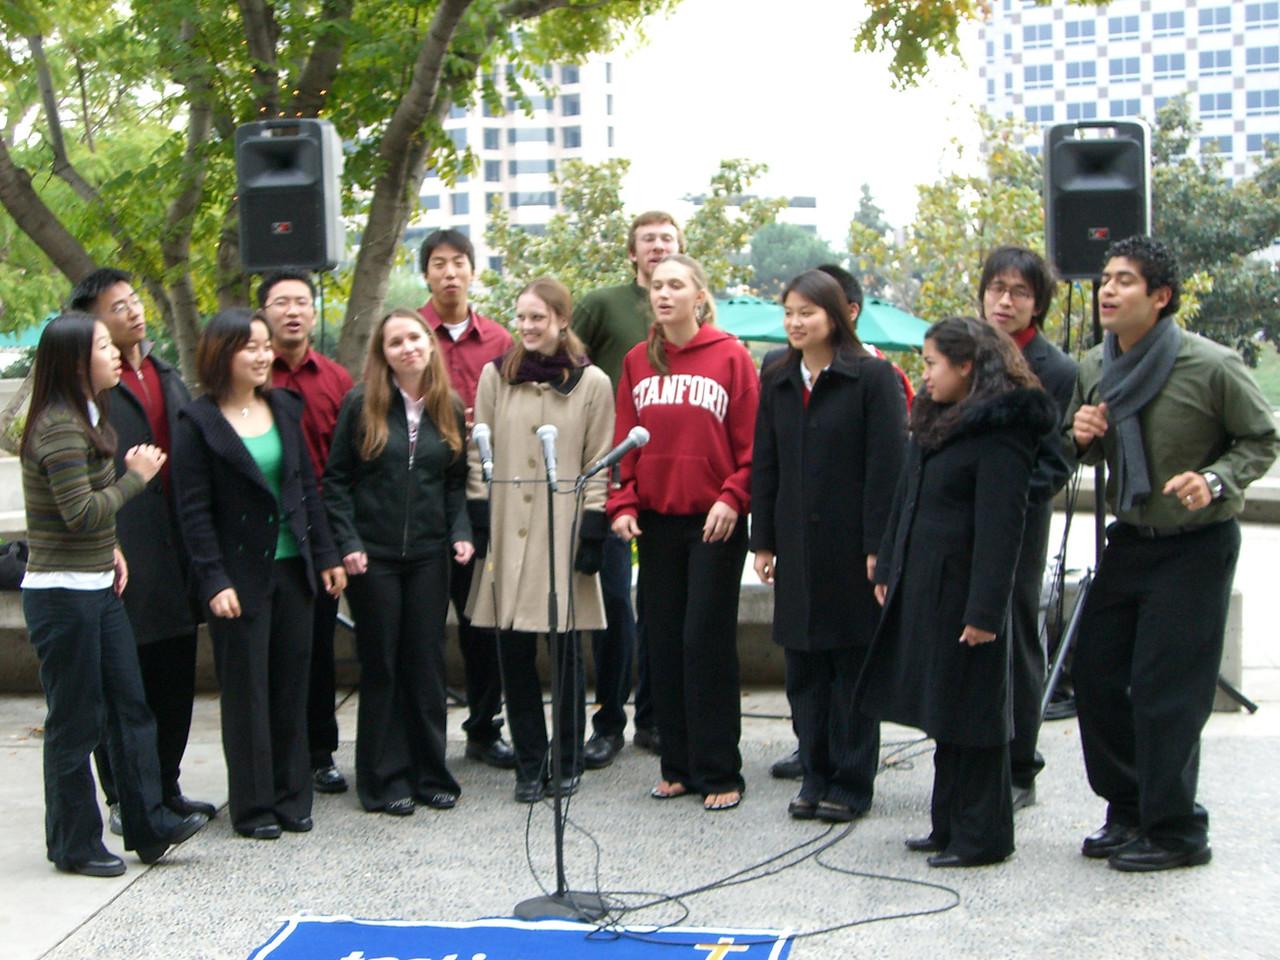 2005 12 18 Sun - Lake Ave Church - Jingle Bells & Pozo lets one rip